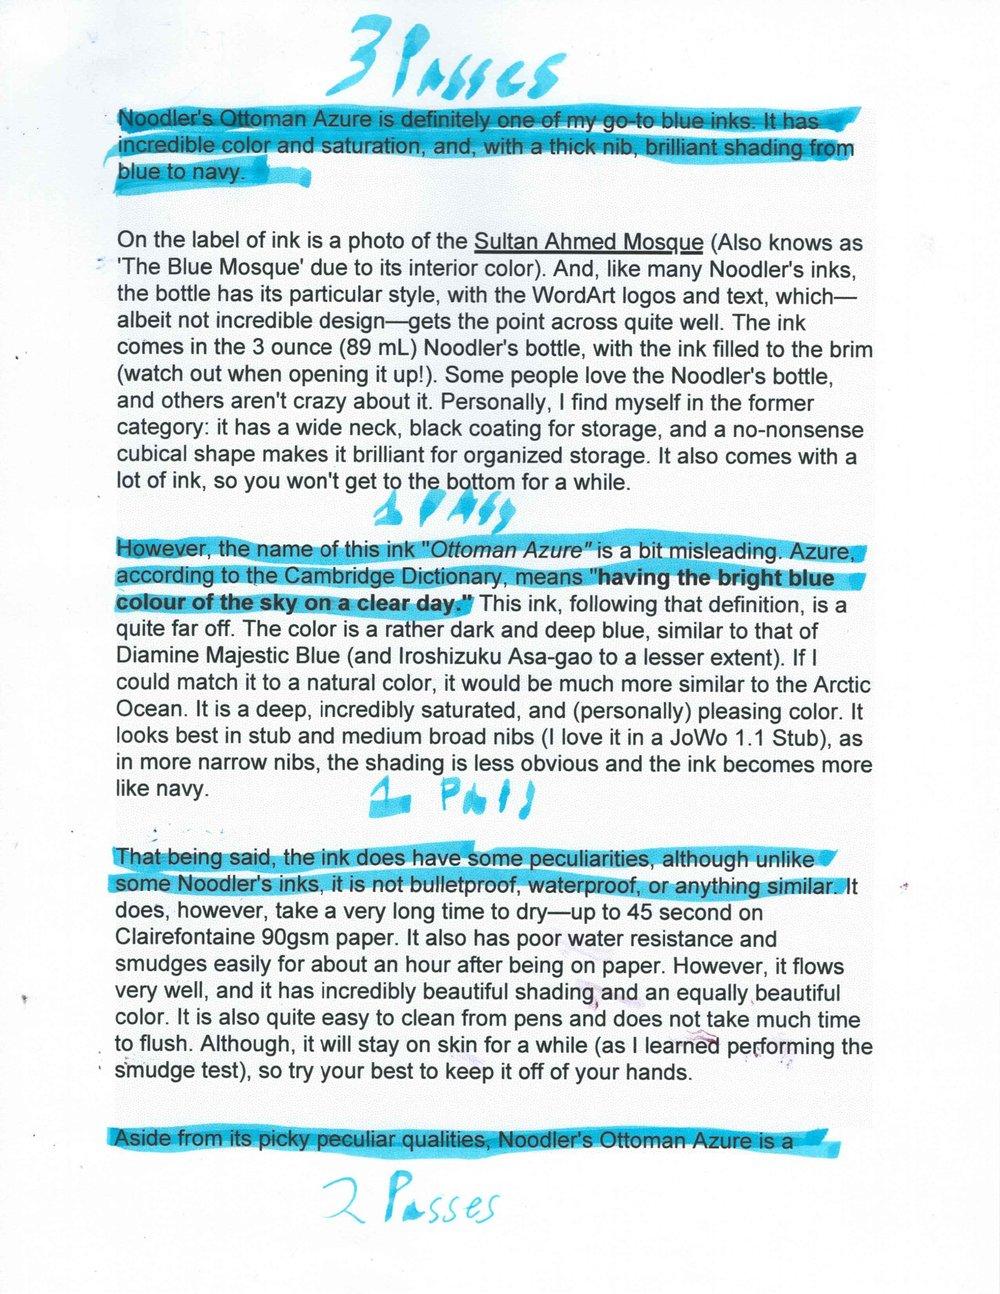 Lightning blue on inkjet copy paper. Pilot Parallel 3.8—3 passes, 1 pass, 1 pass, 2 passes.  Text: Noodler's Ottoman Azure Review